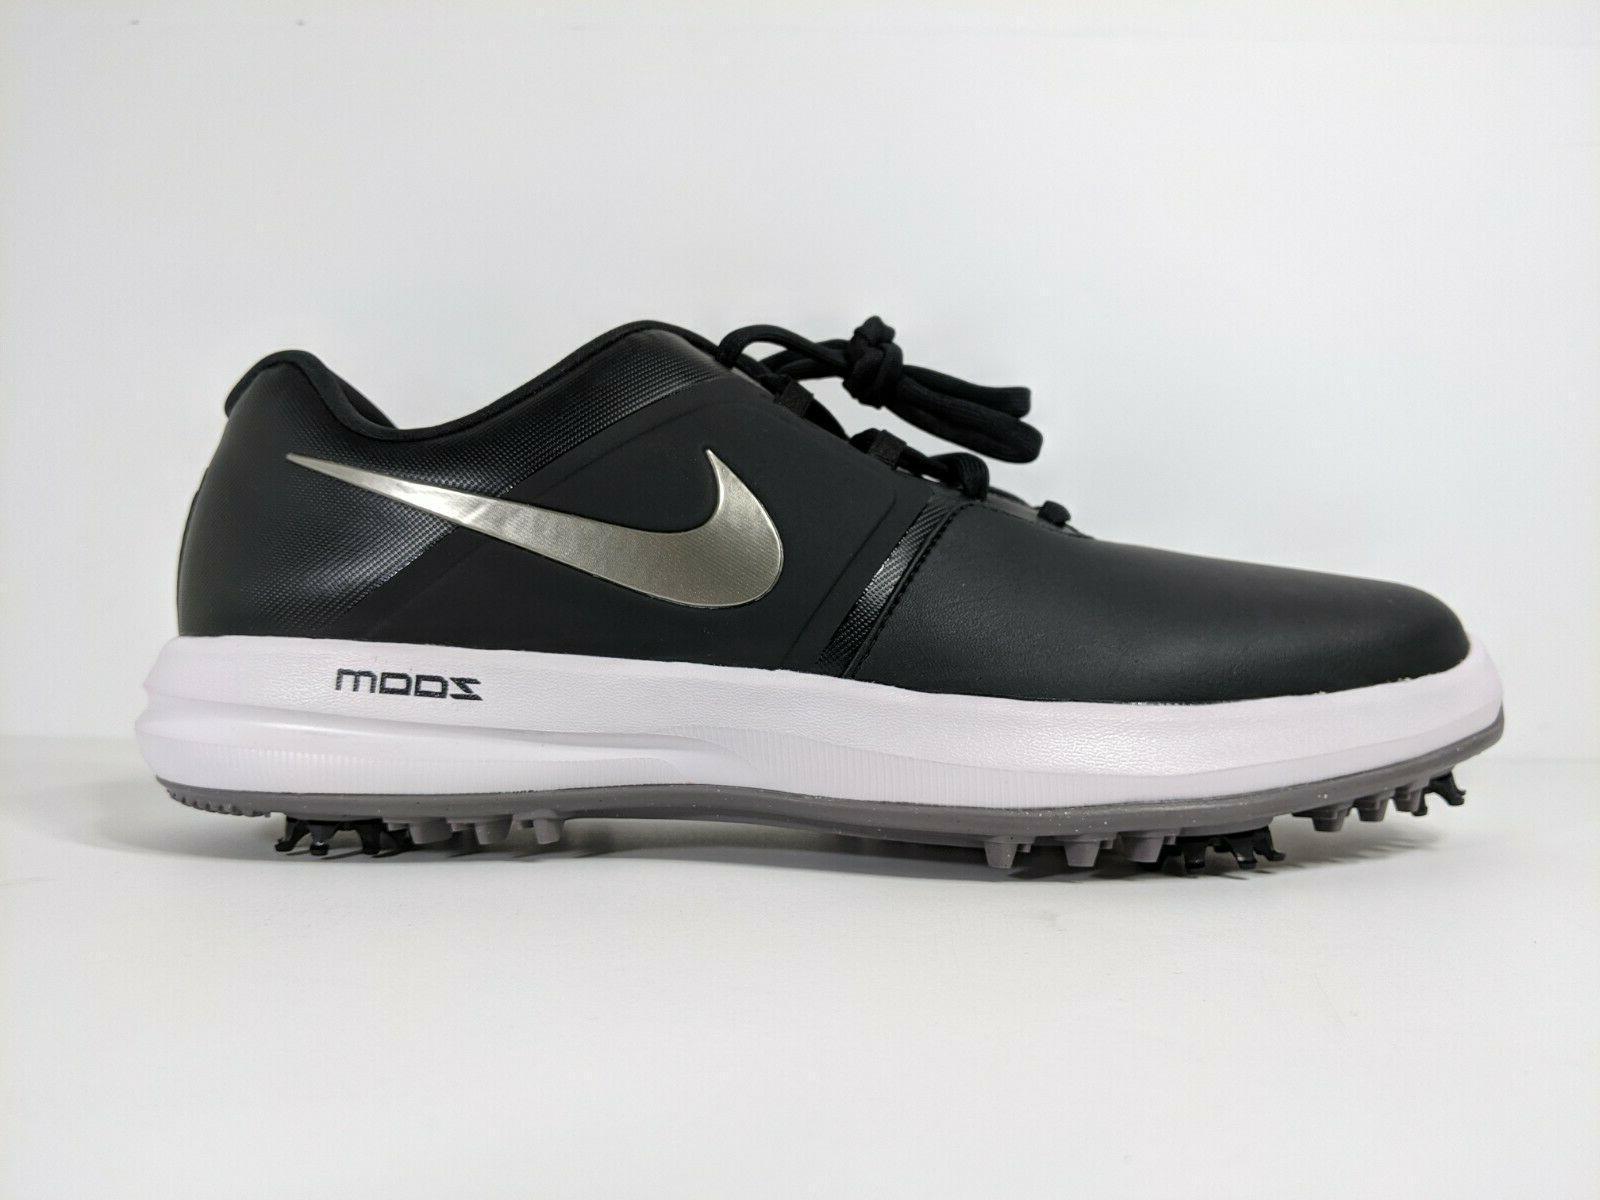 New Nike Air Victory Men's Shoes Black AQ1524-001